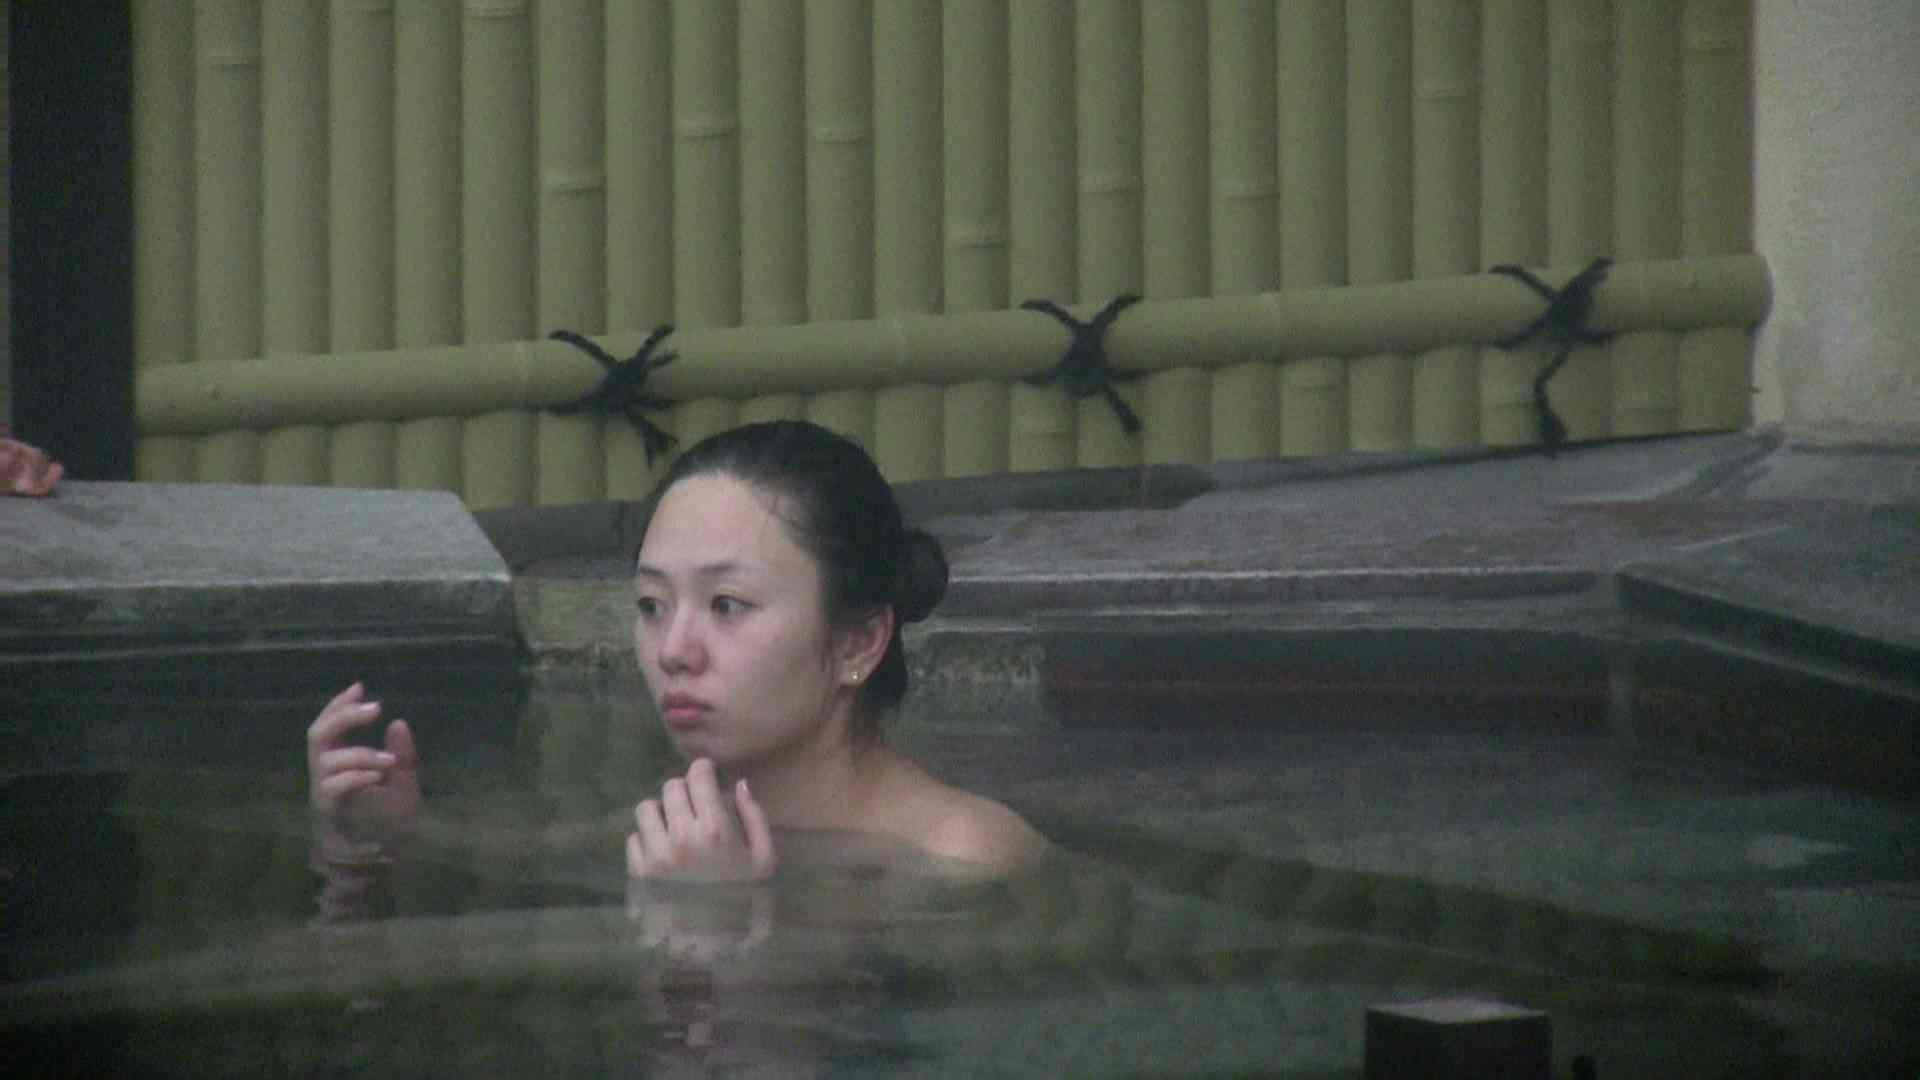 Aquaな露天風呂Vol.586 露天   HなOL  58pic 2